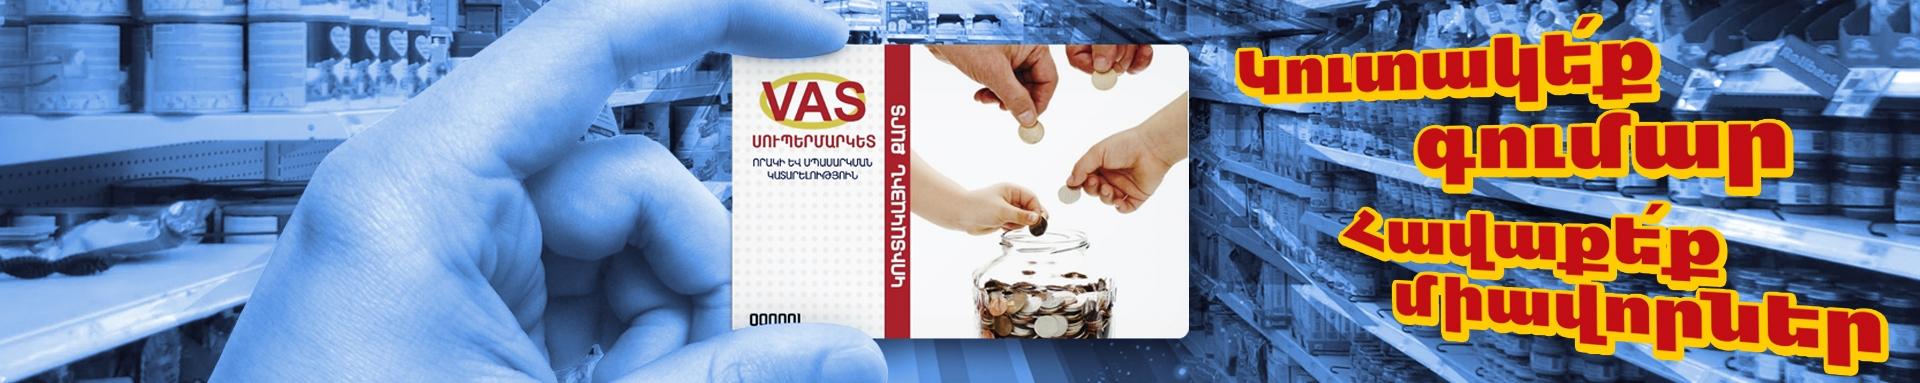 VAS bonus card